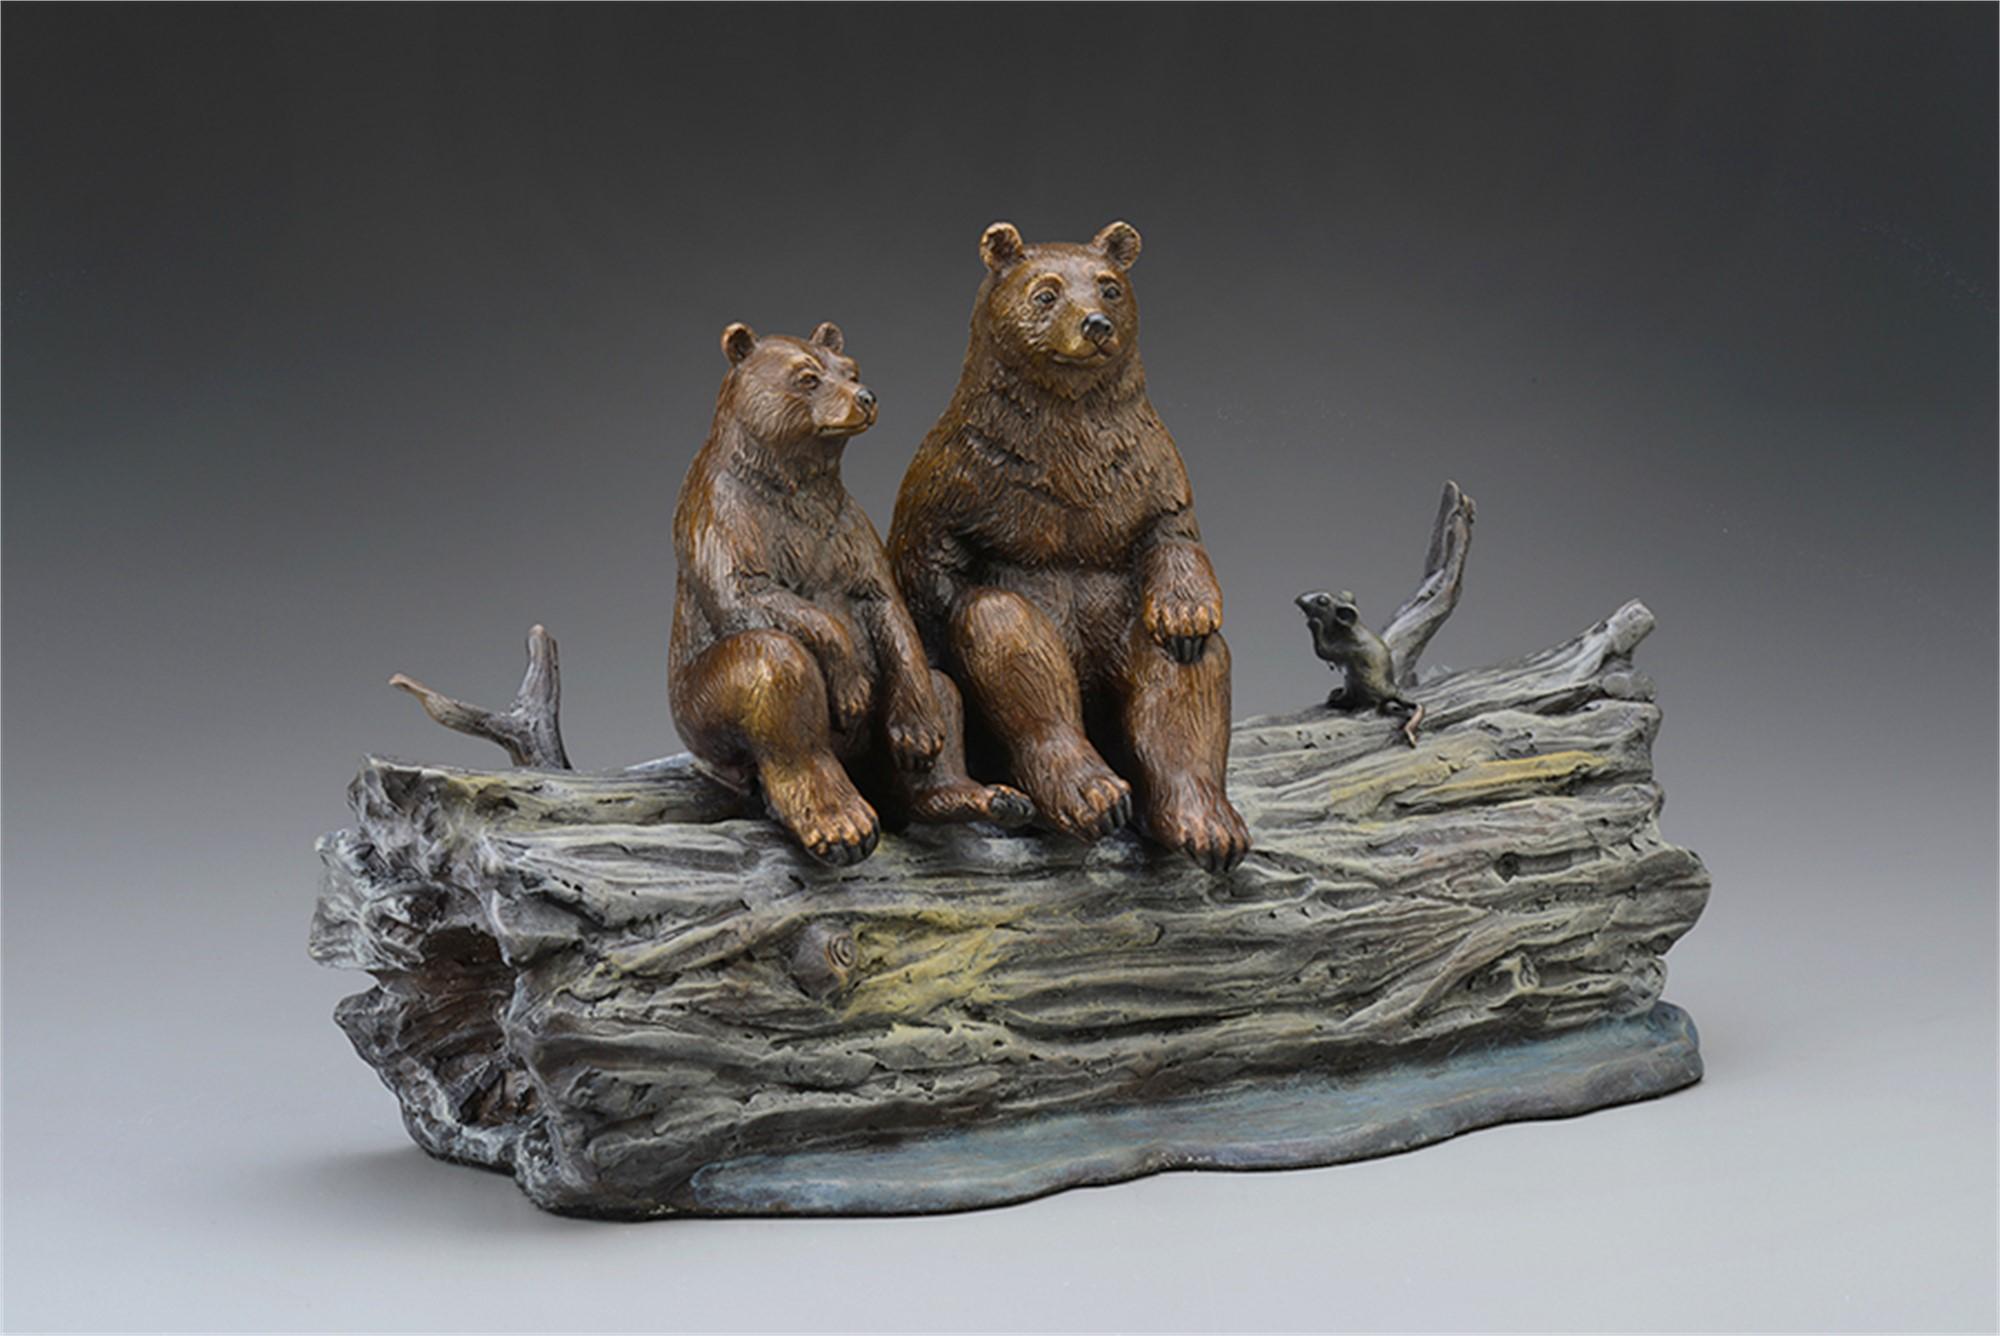 Moonlighters (Sculpture) by Robert Bissell